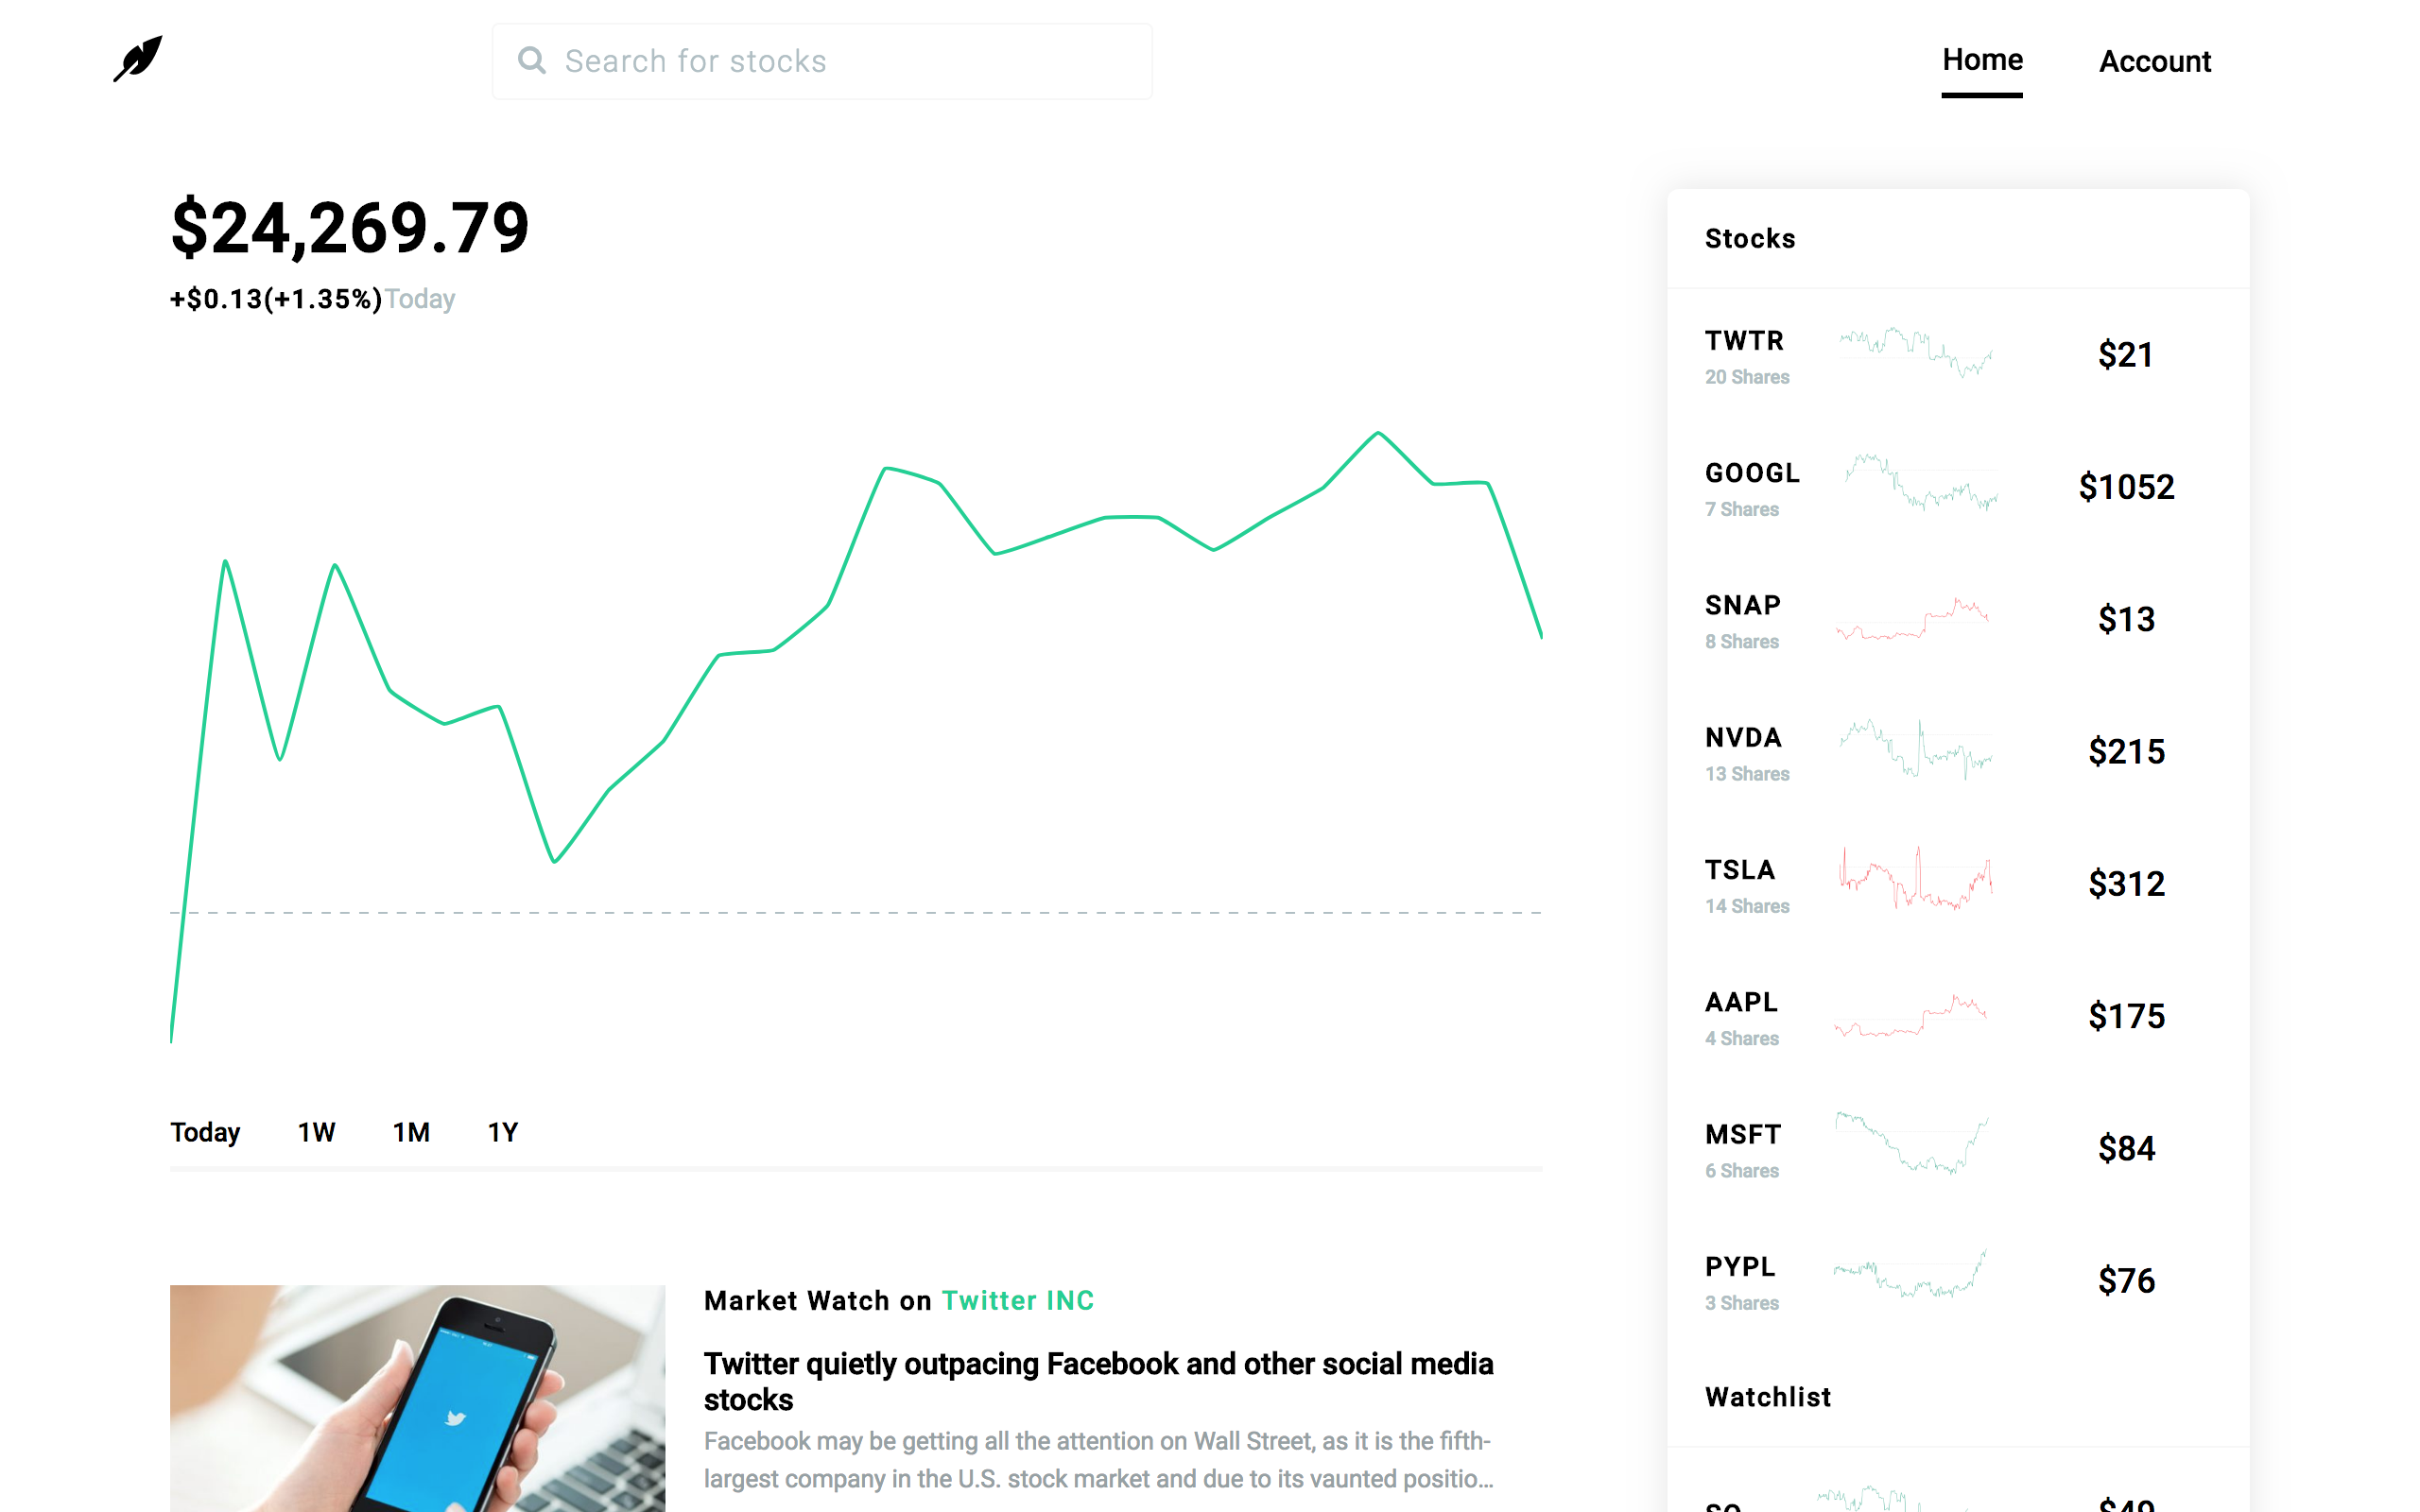 StockOverflow